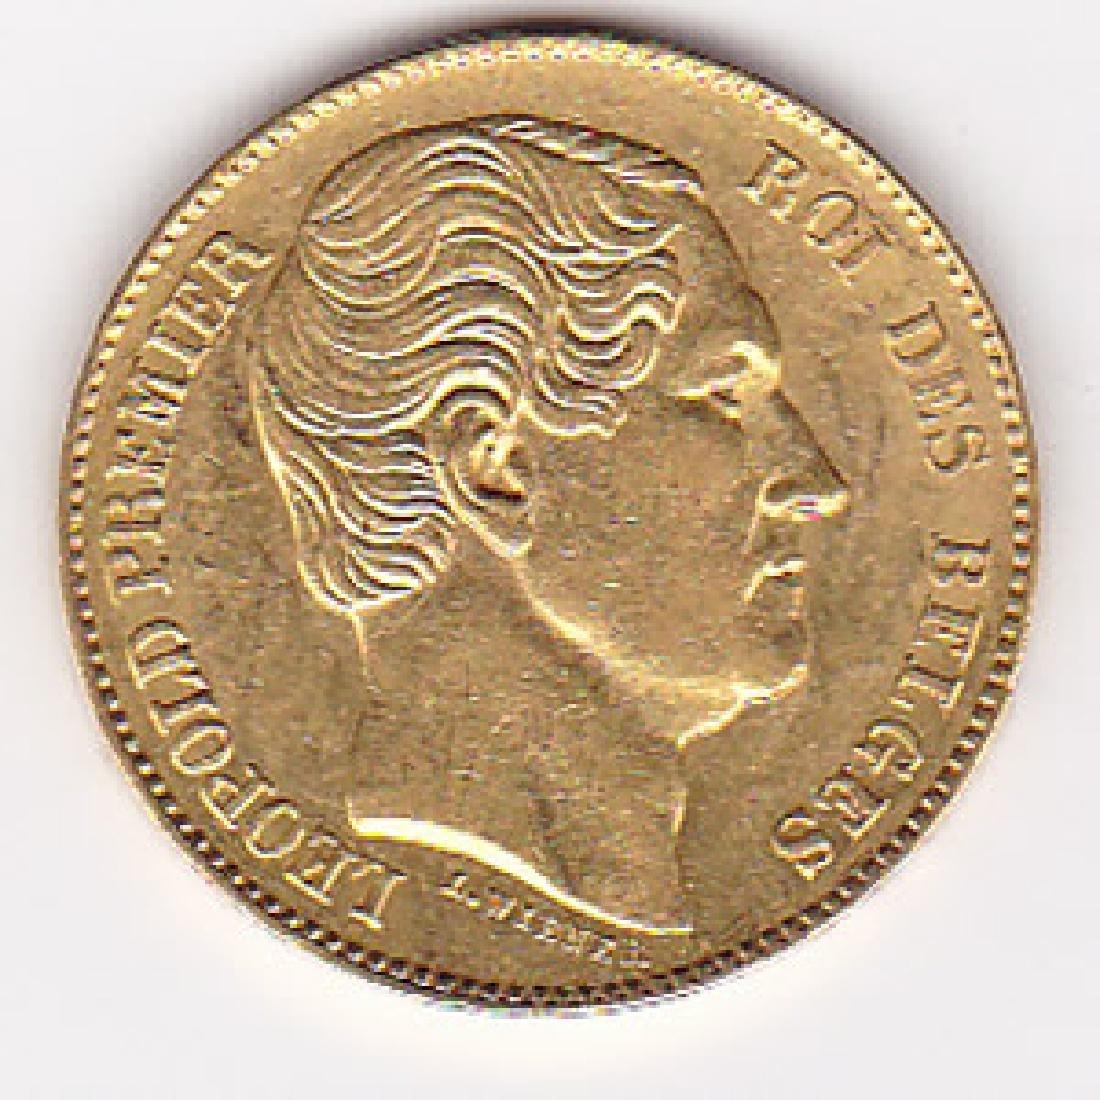 Belgium 20 francs gold 1865 Leopold I VF-XF